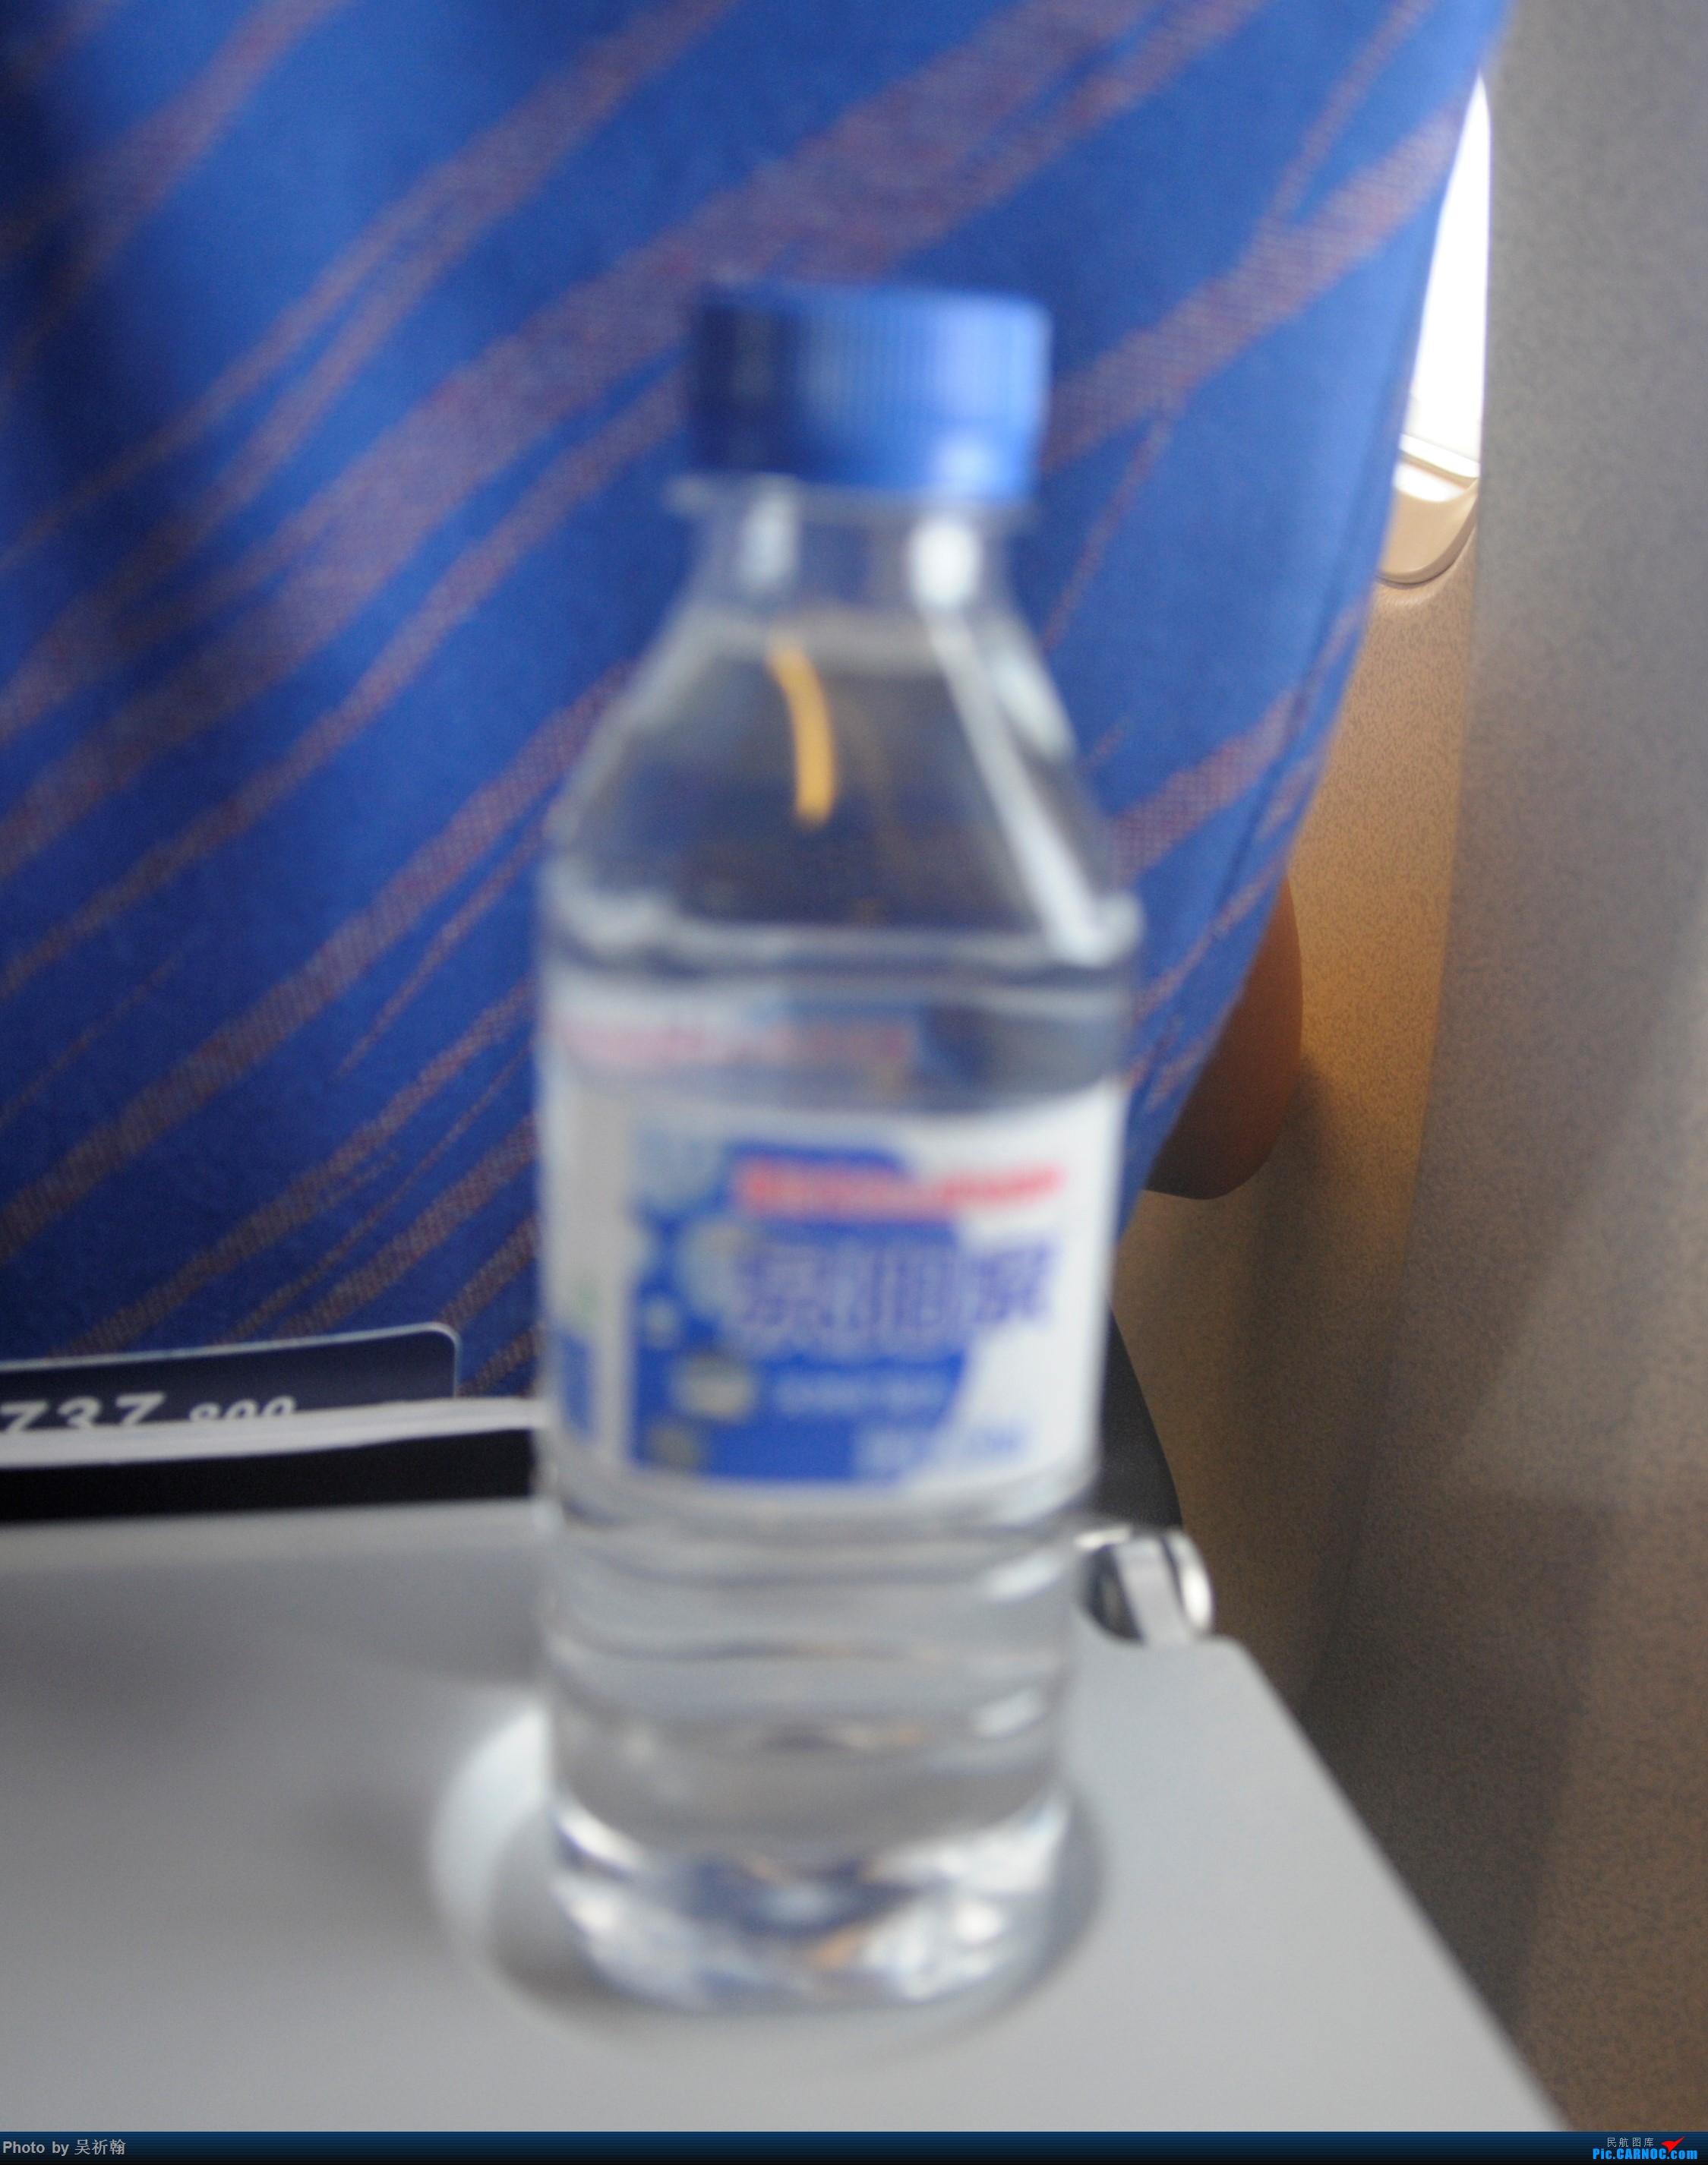 Re:[原创]Kian的飞行游记1:飞往无锡 BOEING 737-800 B-5149